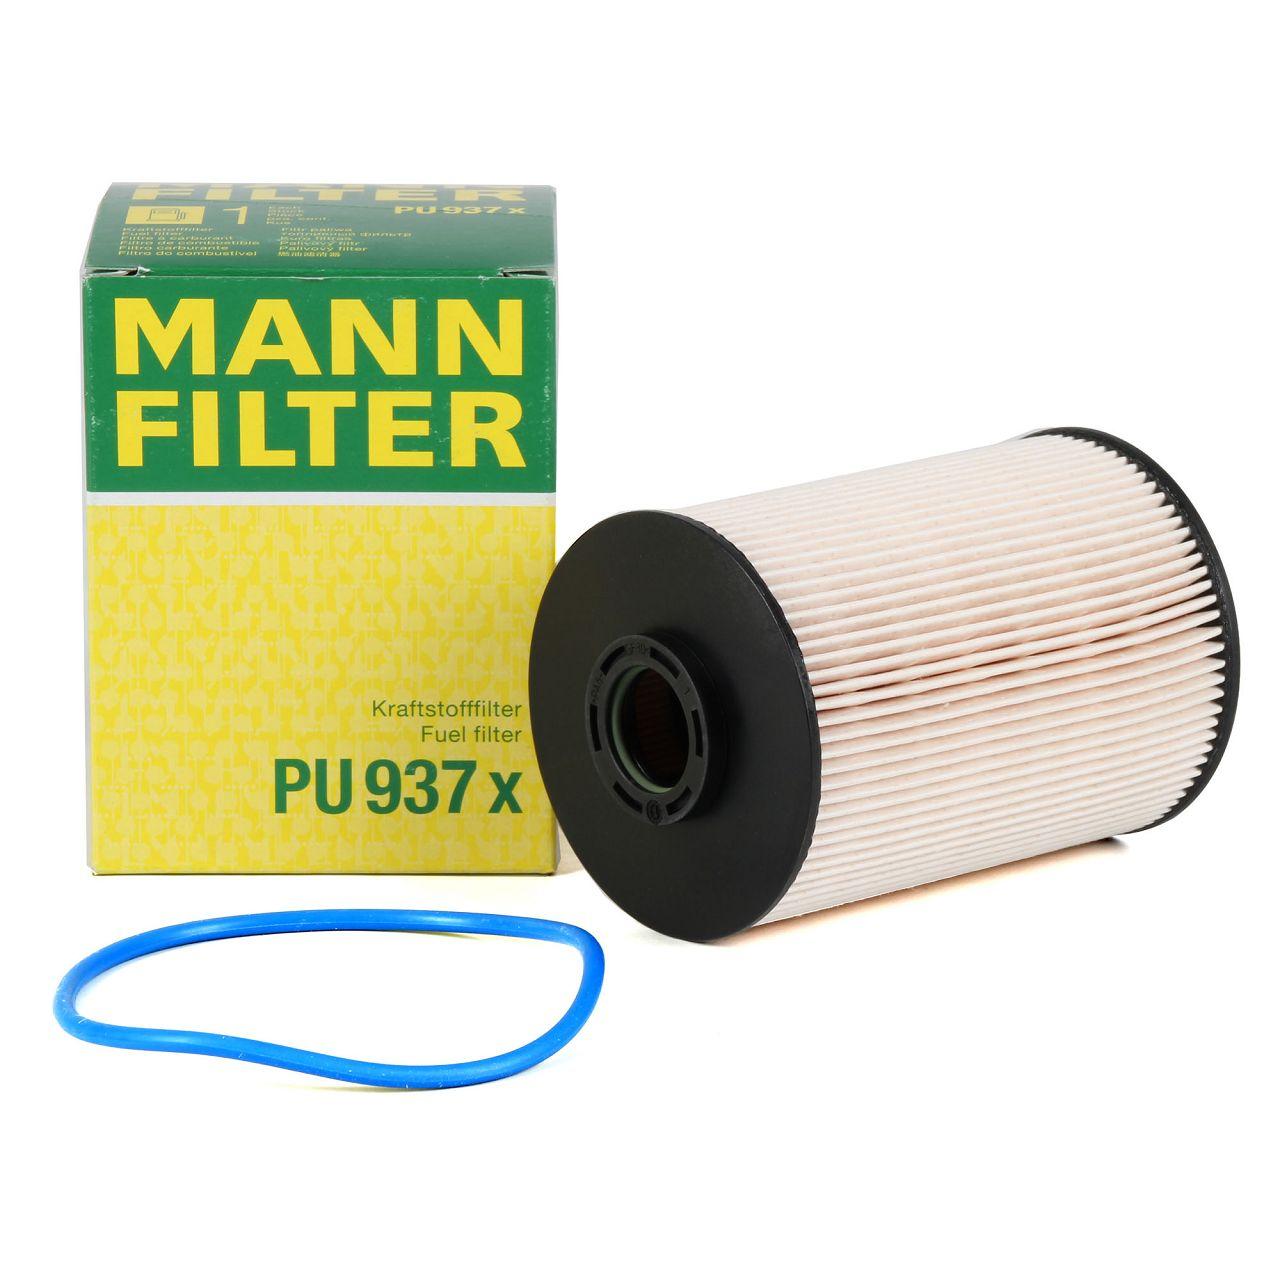 MANN PU937X Kraftstofffilter Dieselfilter CITROEN C5 C6 PEUGEOT 407 607 2.7 TDI